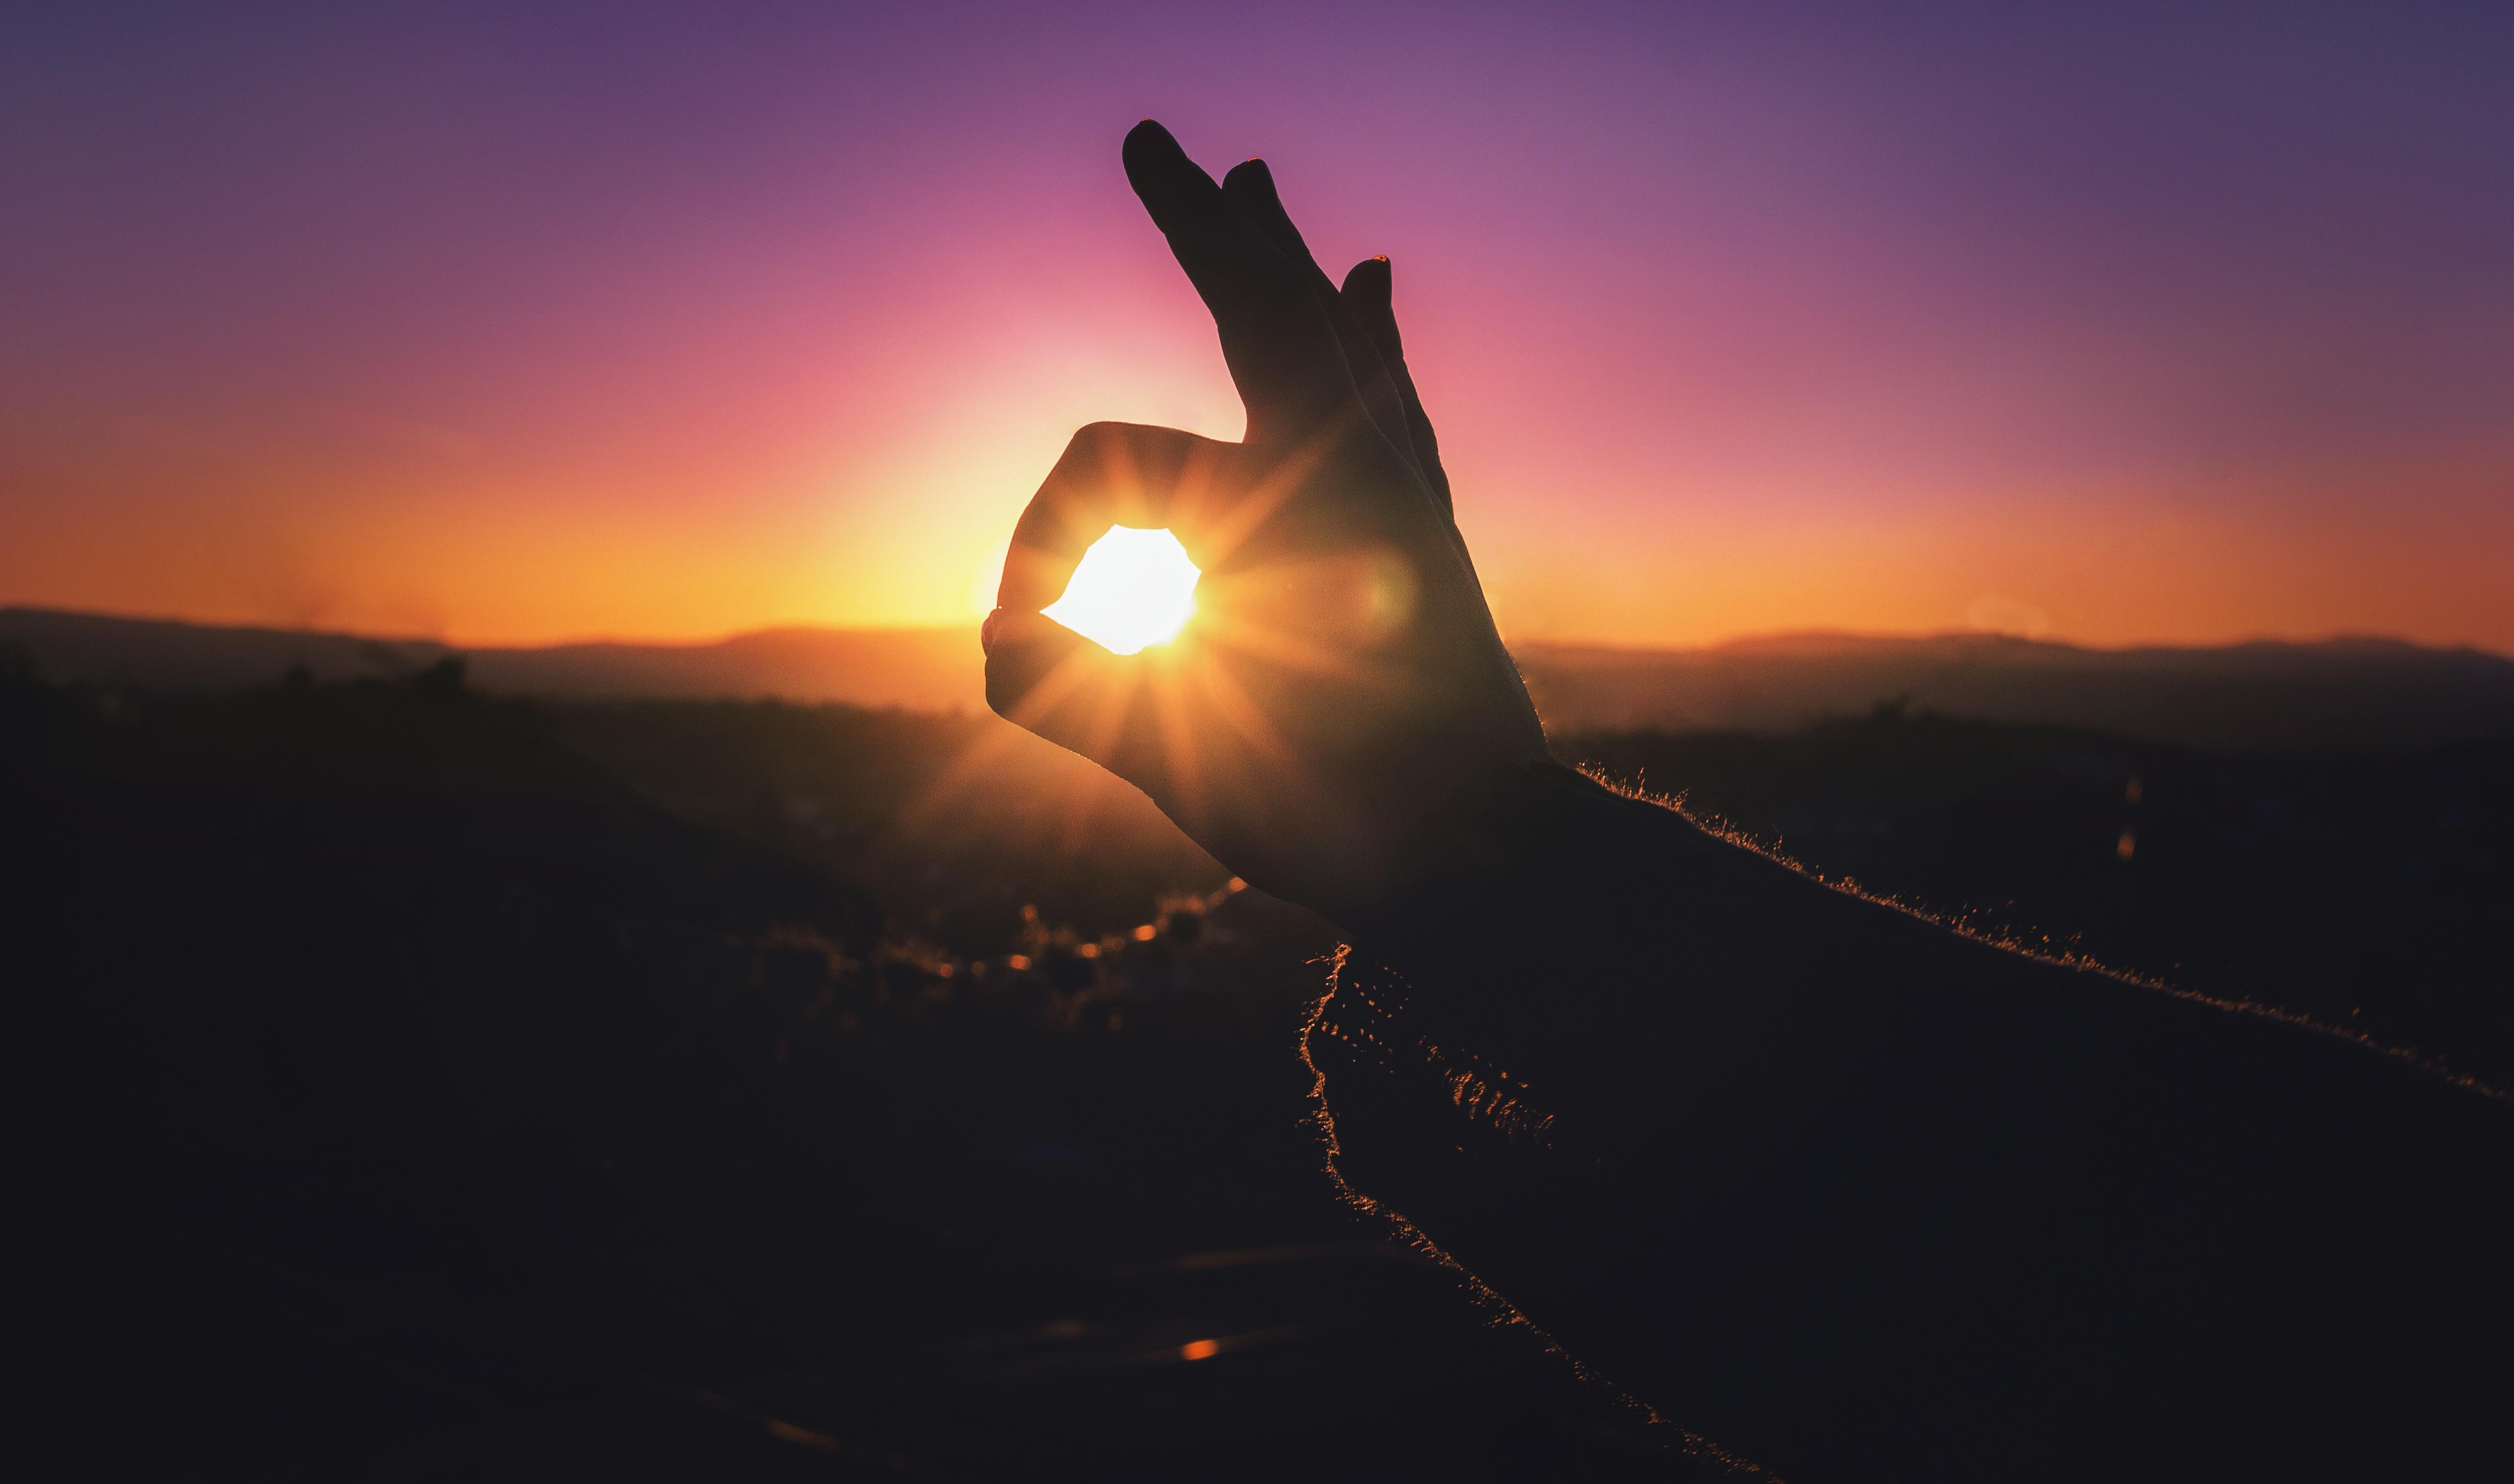 sunset-1331088.jpg